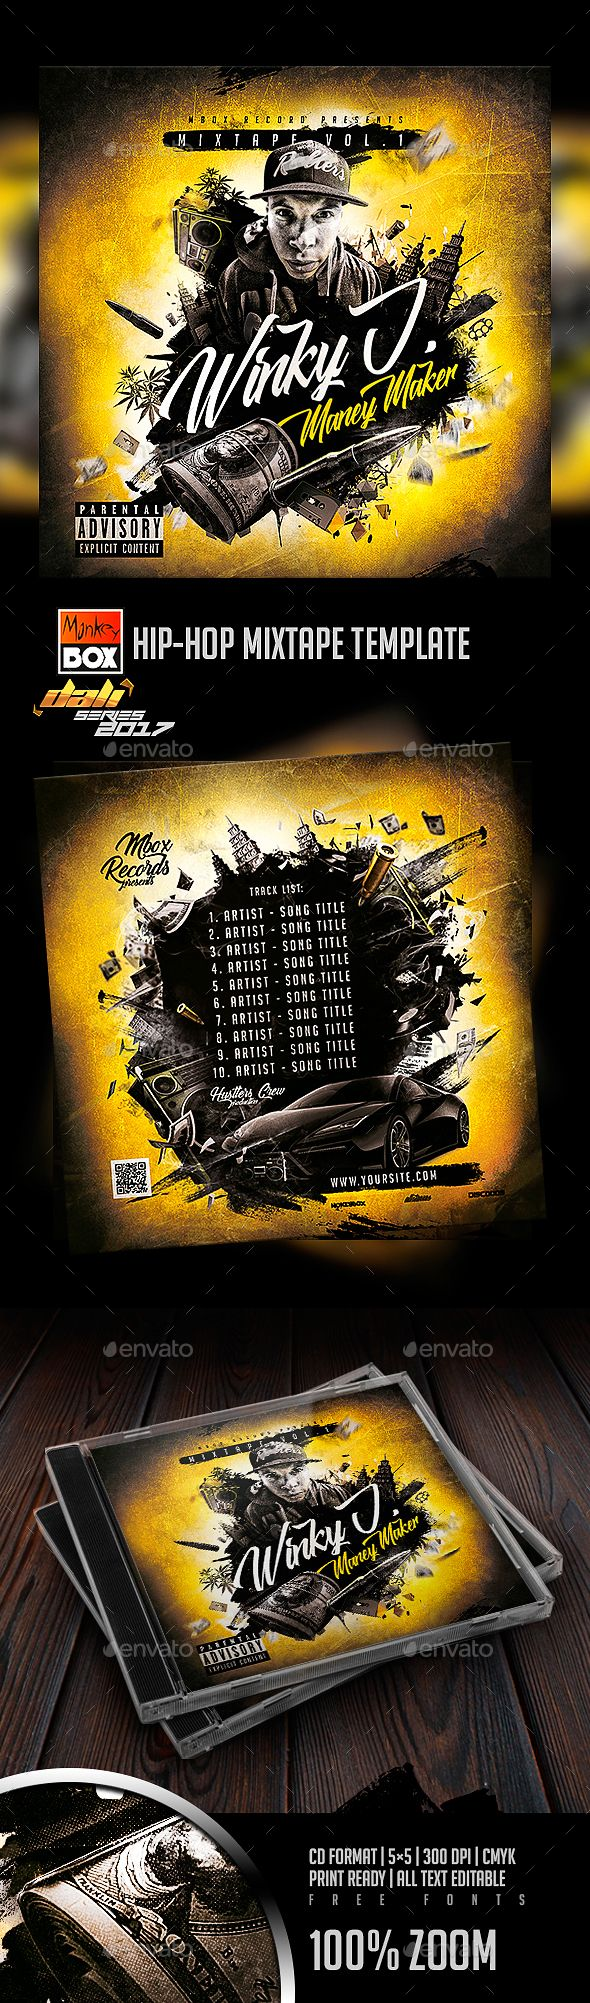 Hip Hop Mixtape Template Cd Dvd Artwork Print Templates Cd